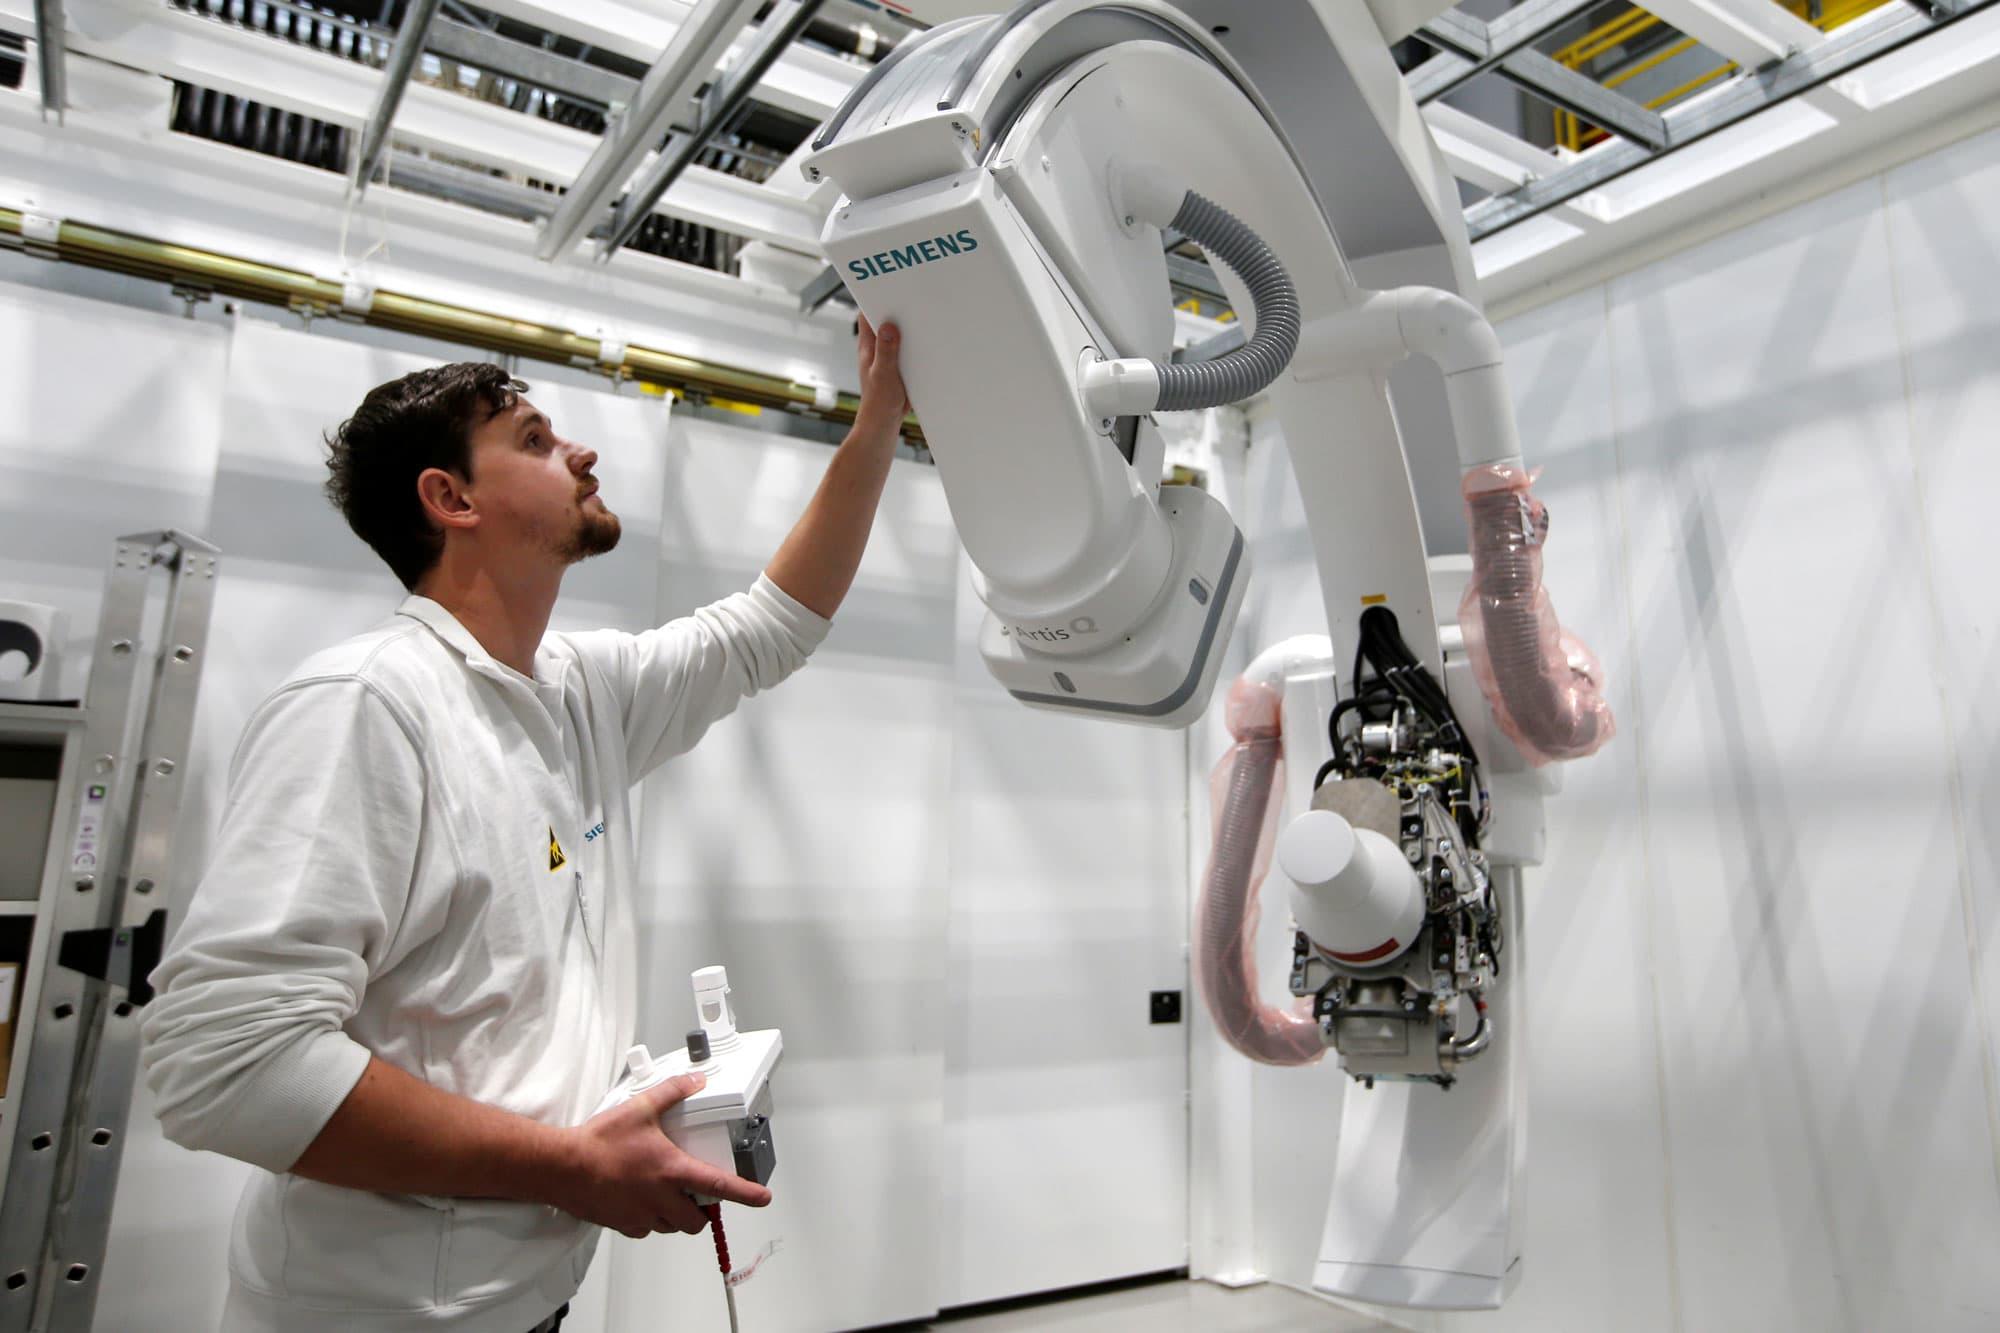 Siemens Healthineers buys Corindus for $1 1 billion